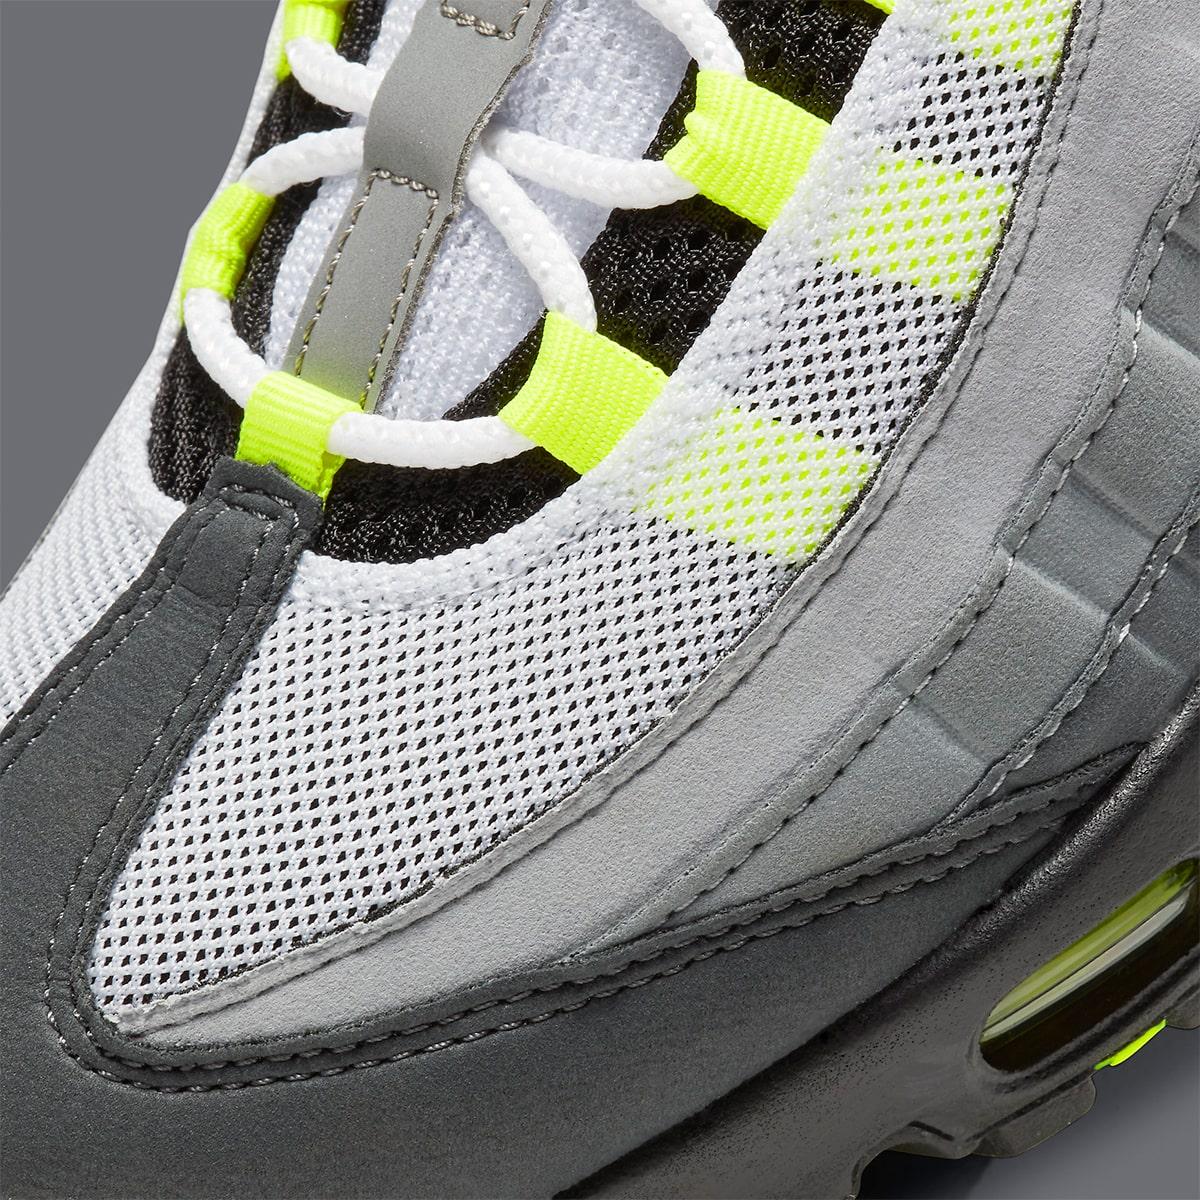 Nike-Air-Max-95-OG-Neon-CT1689-001-8